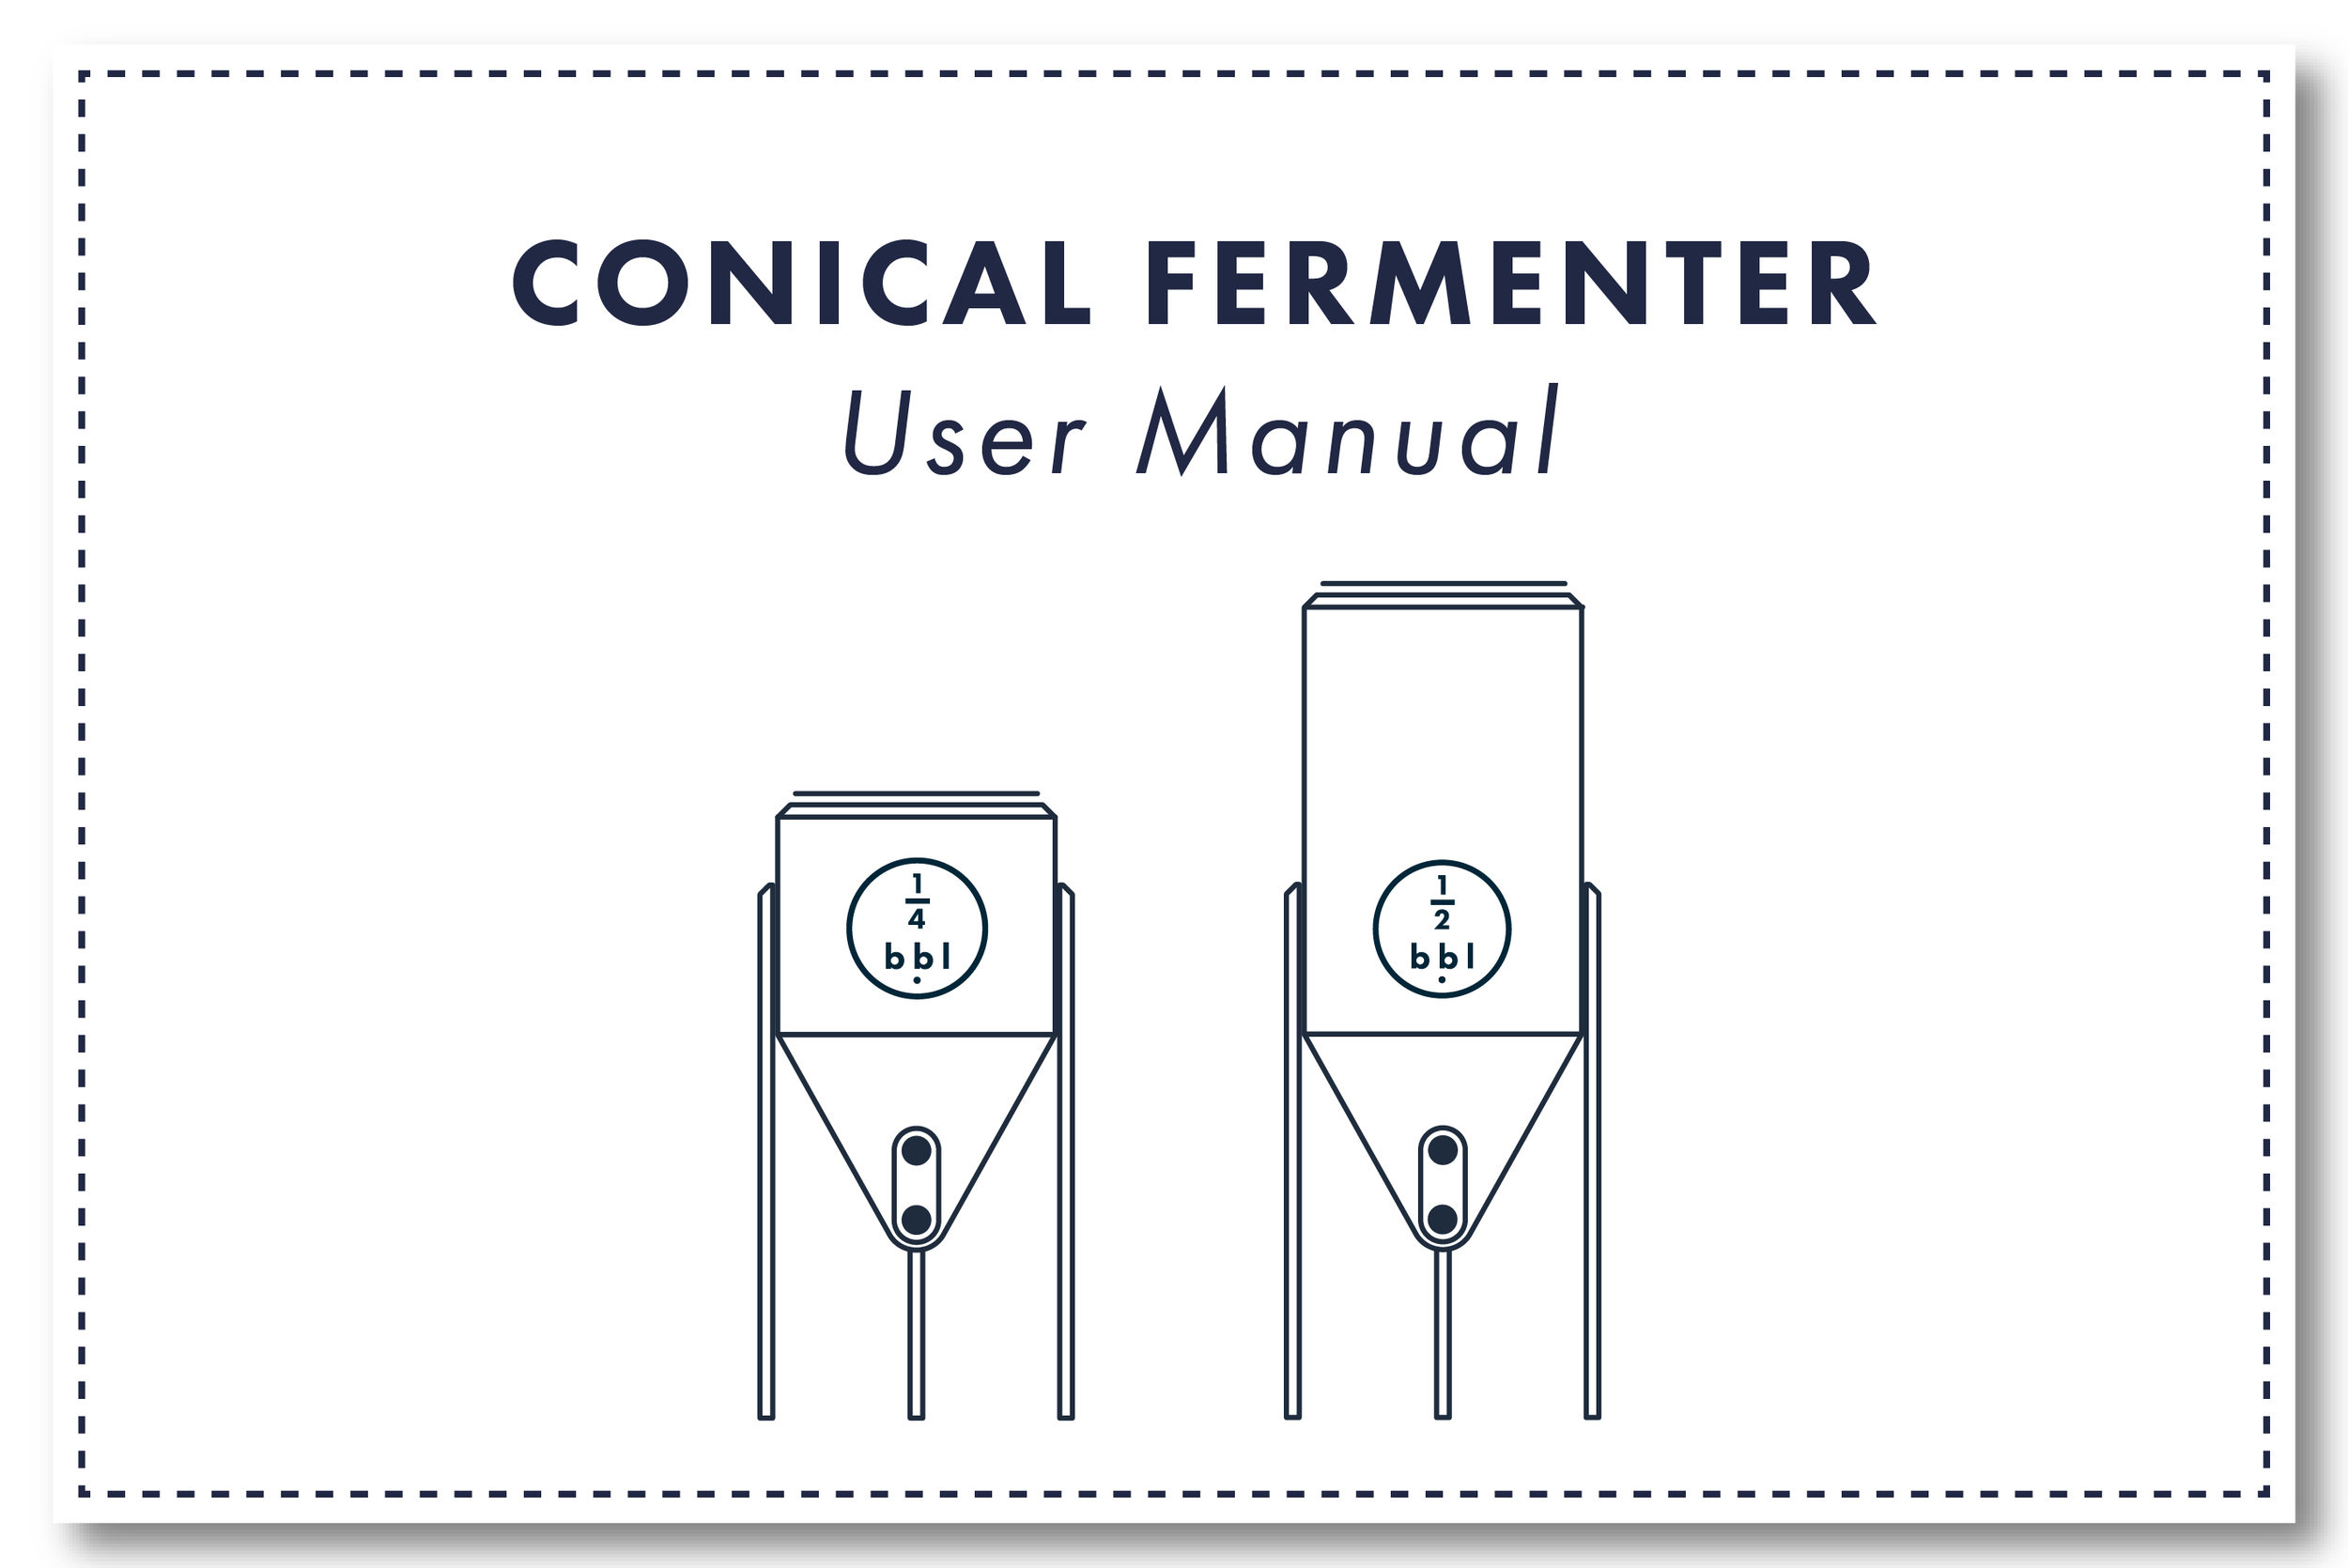 User Manual clickthrough image 03-01.jpg